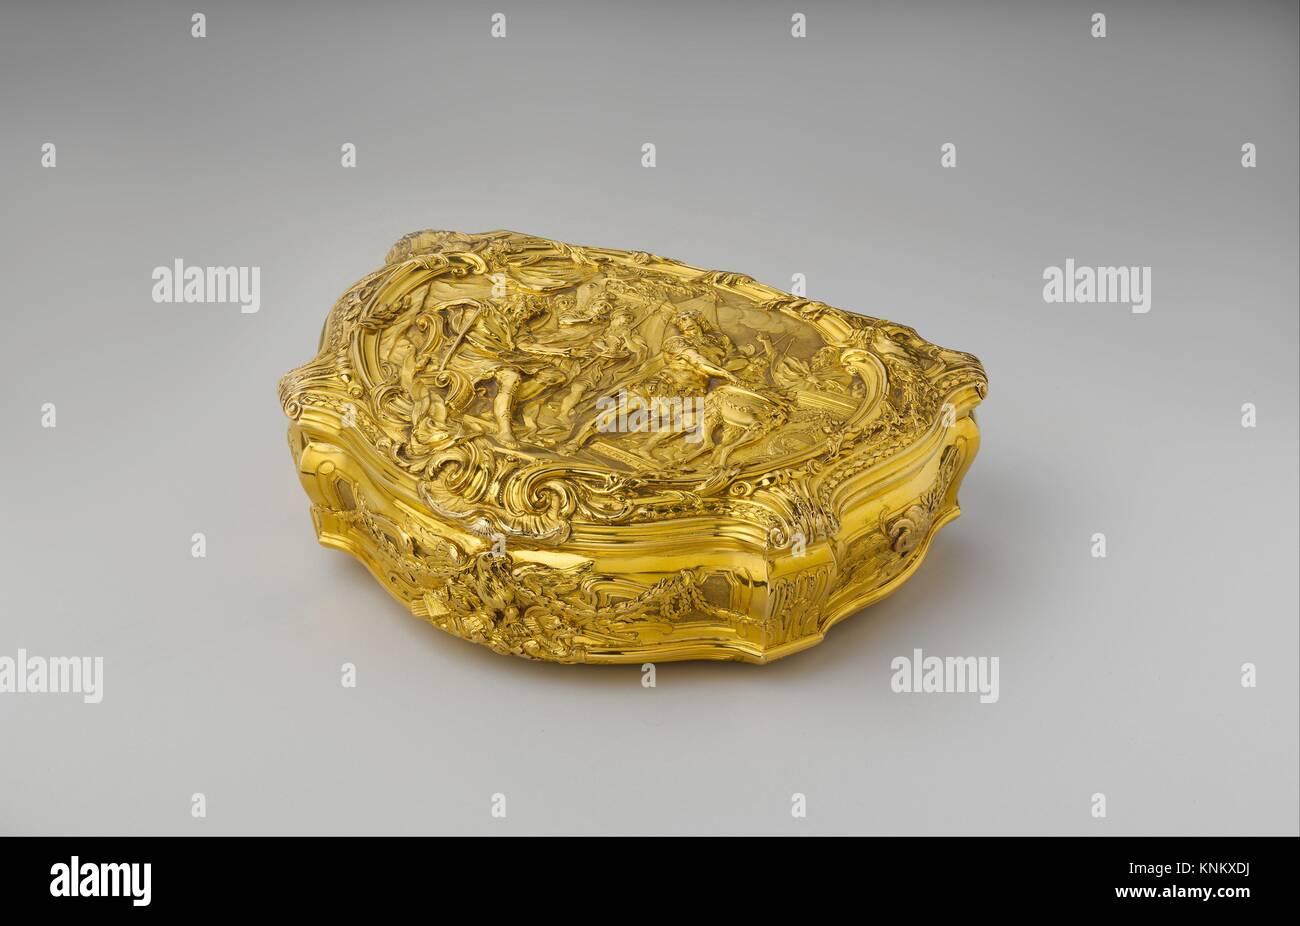 Box with scene depicting Roman hero Gaius Mucius Scaevola before the Etruscan king Lars Porsena. Goldsmith: P R - Stock Image